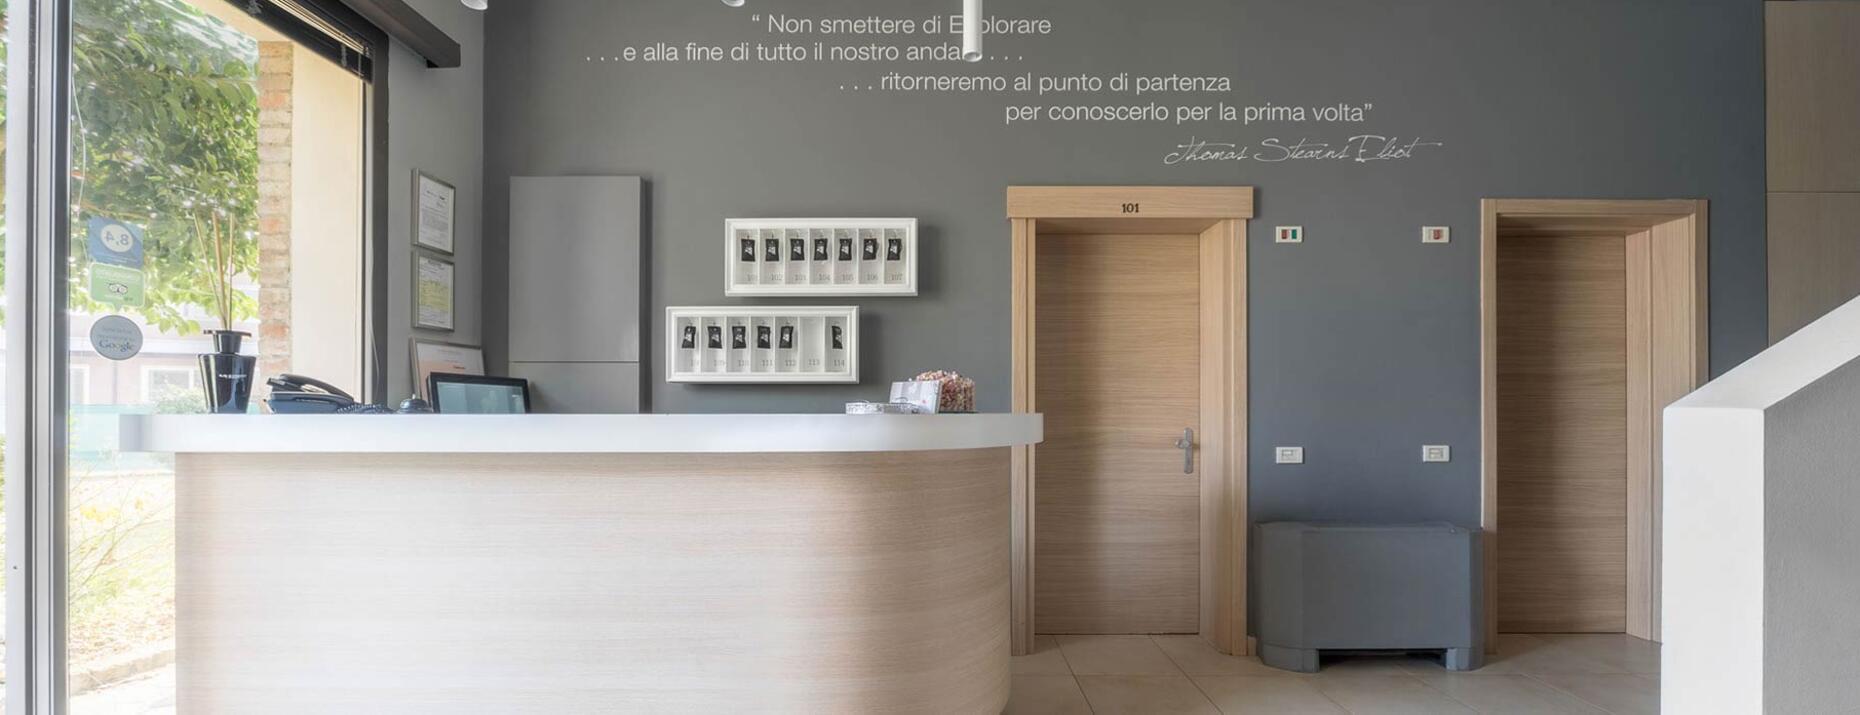 hotelcastellodargile it gallery 006